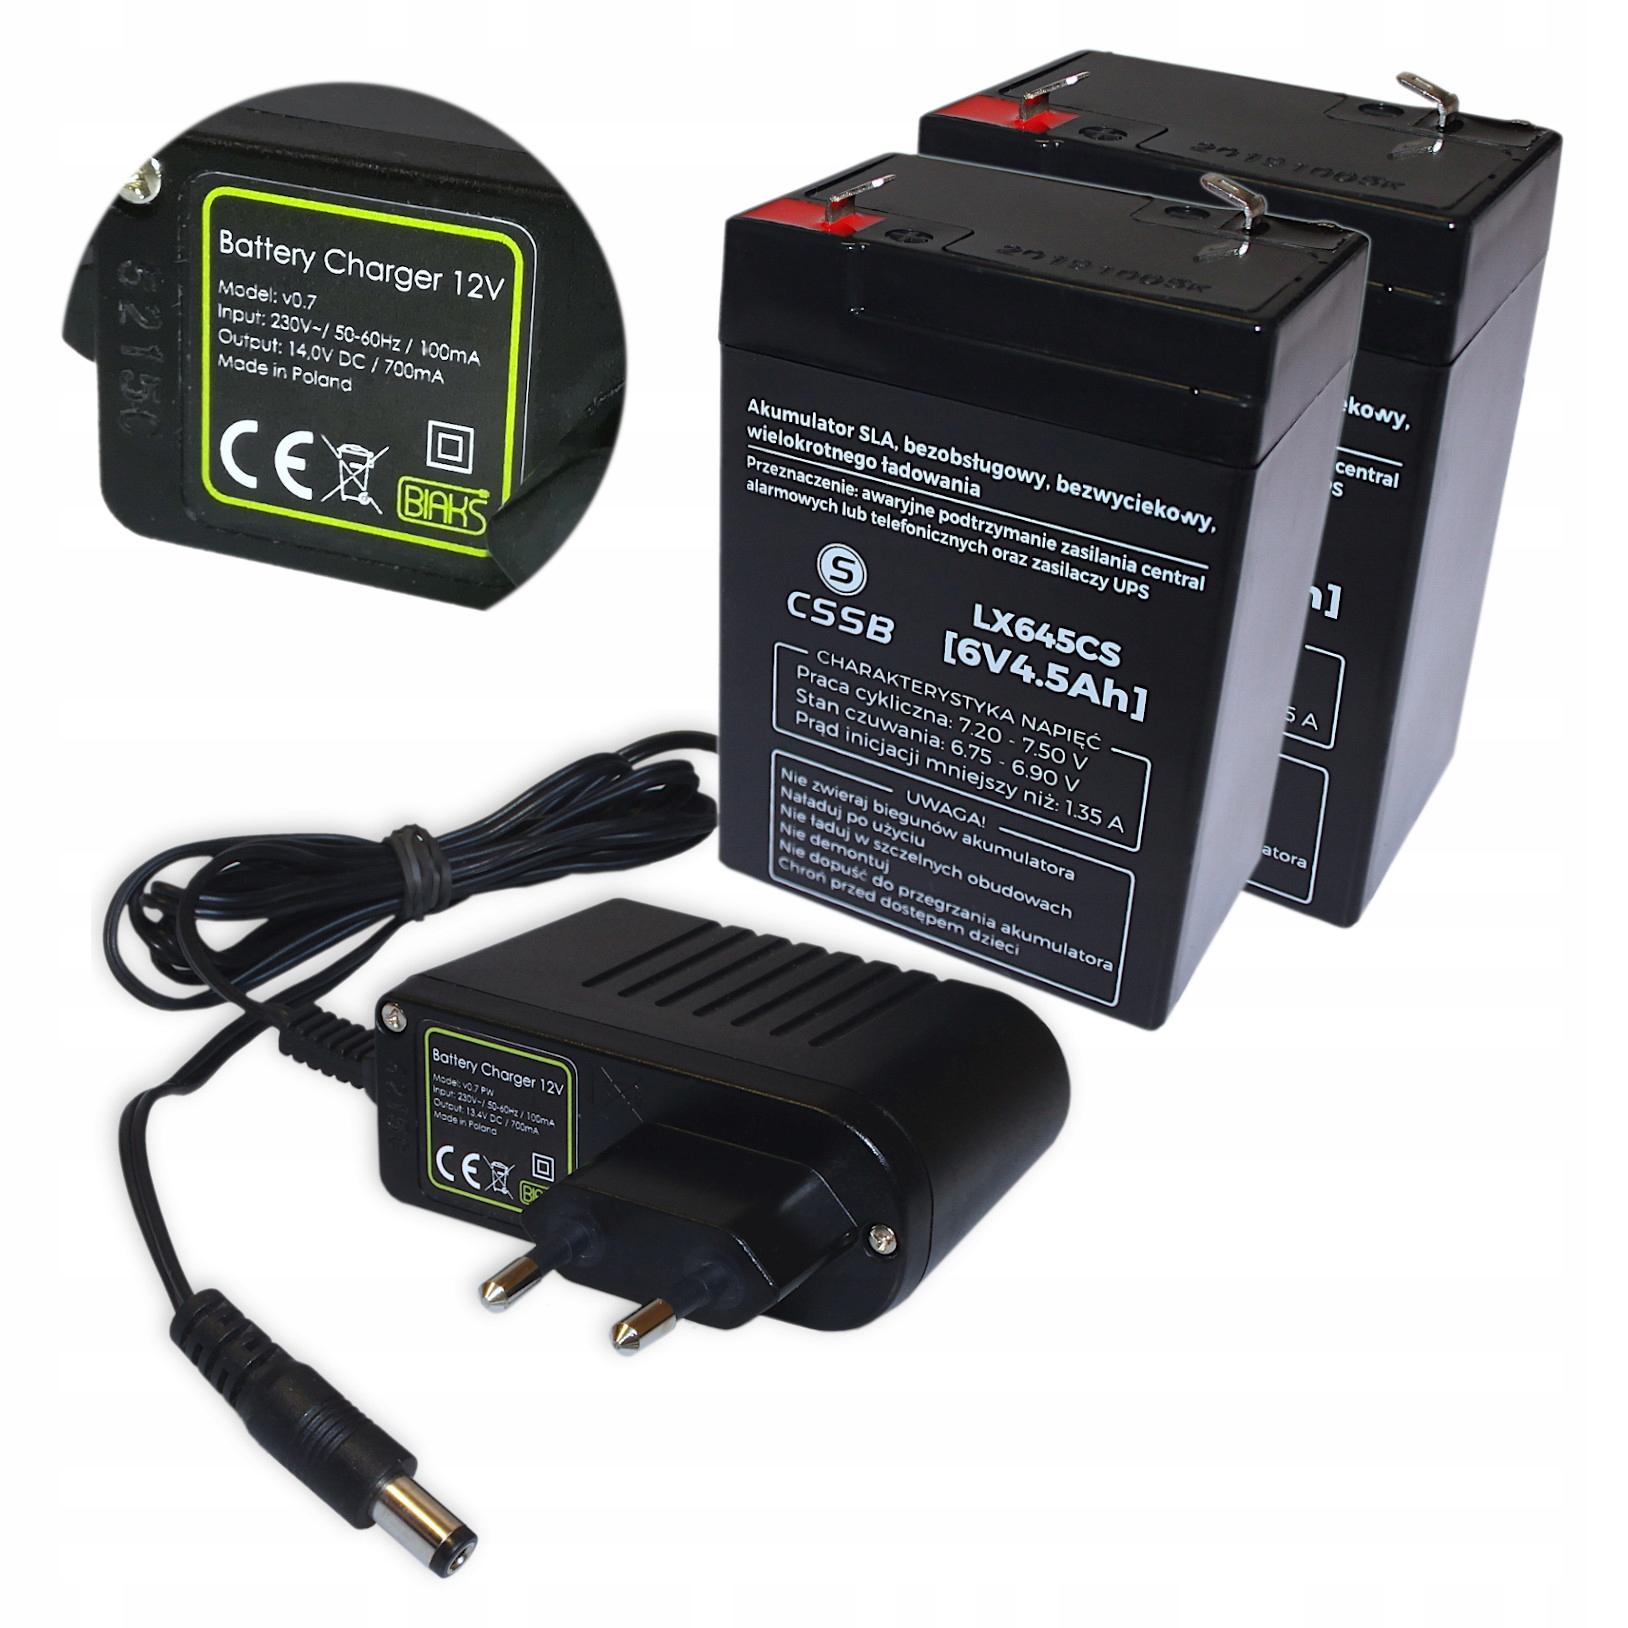 АВТОМОБИЛЬ 2x аккумулятор 6V 4.5Ah + зарядное устройство